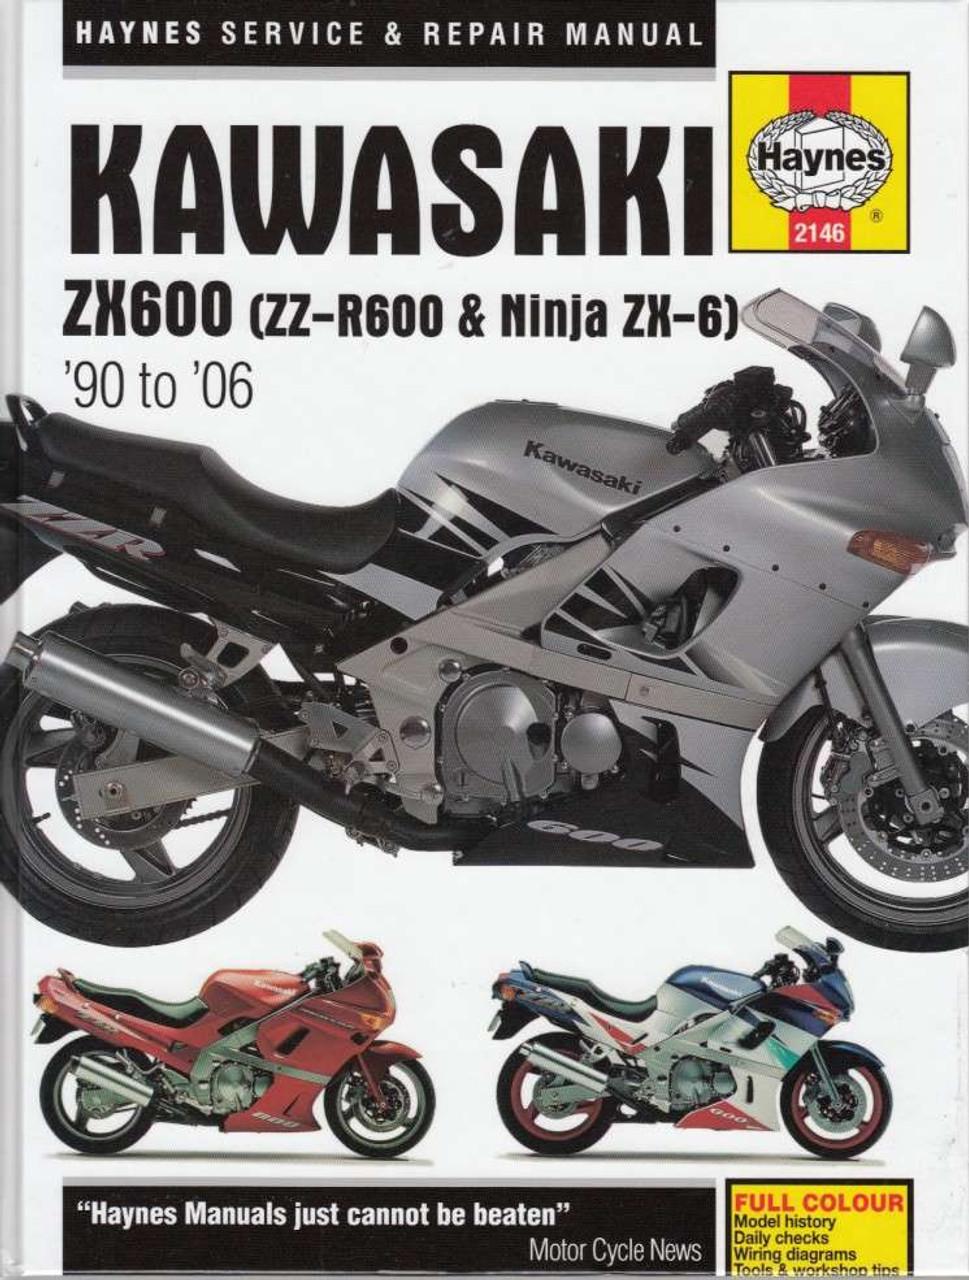 kawasaki zx600 (zz r600, ninja zx 6) 1990 2006 workshop manual Ninja 00 Kawasaki Wiring-Diagram